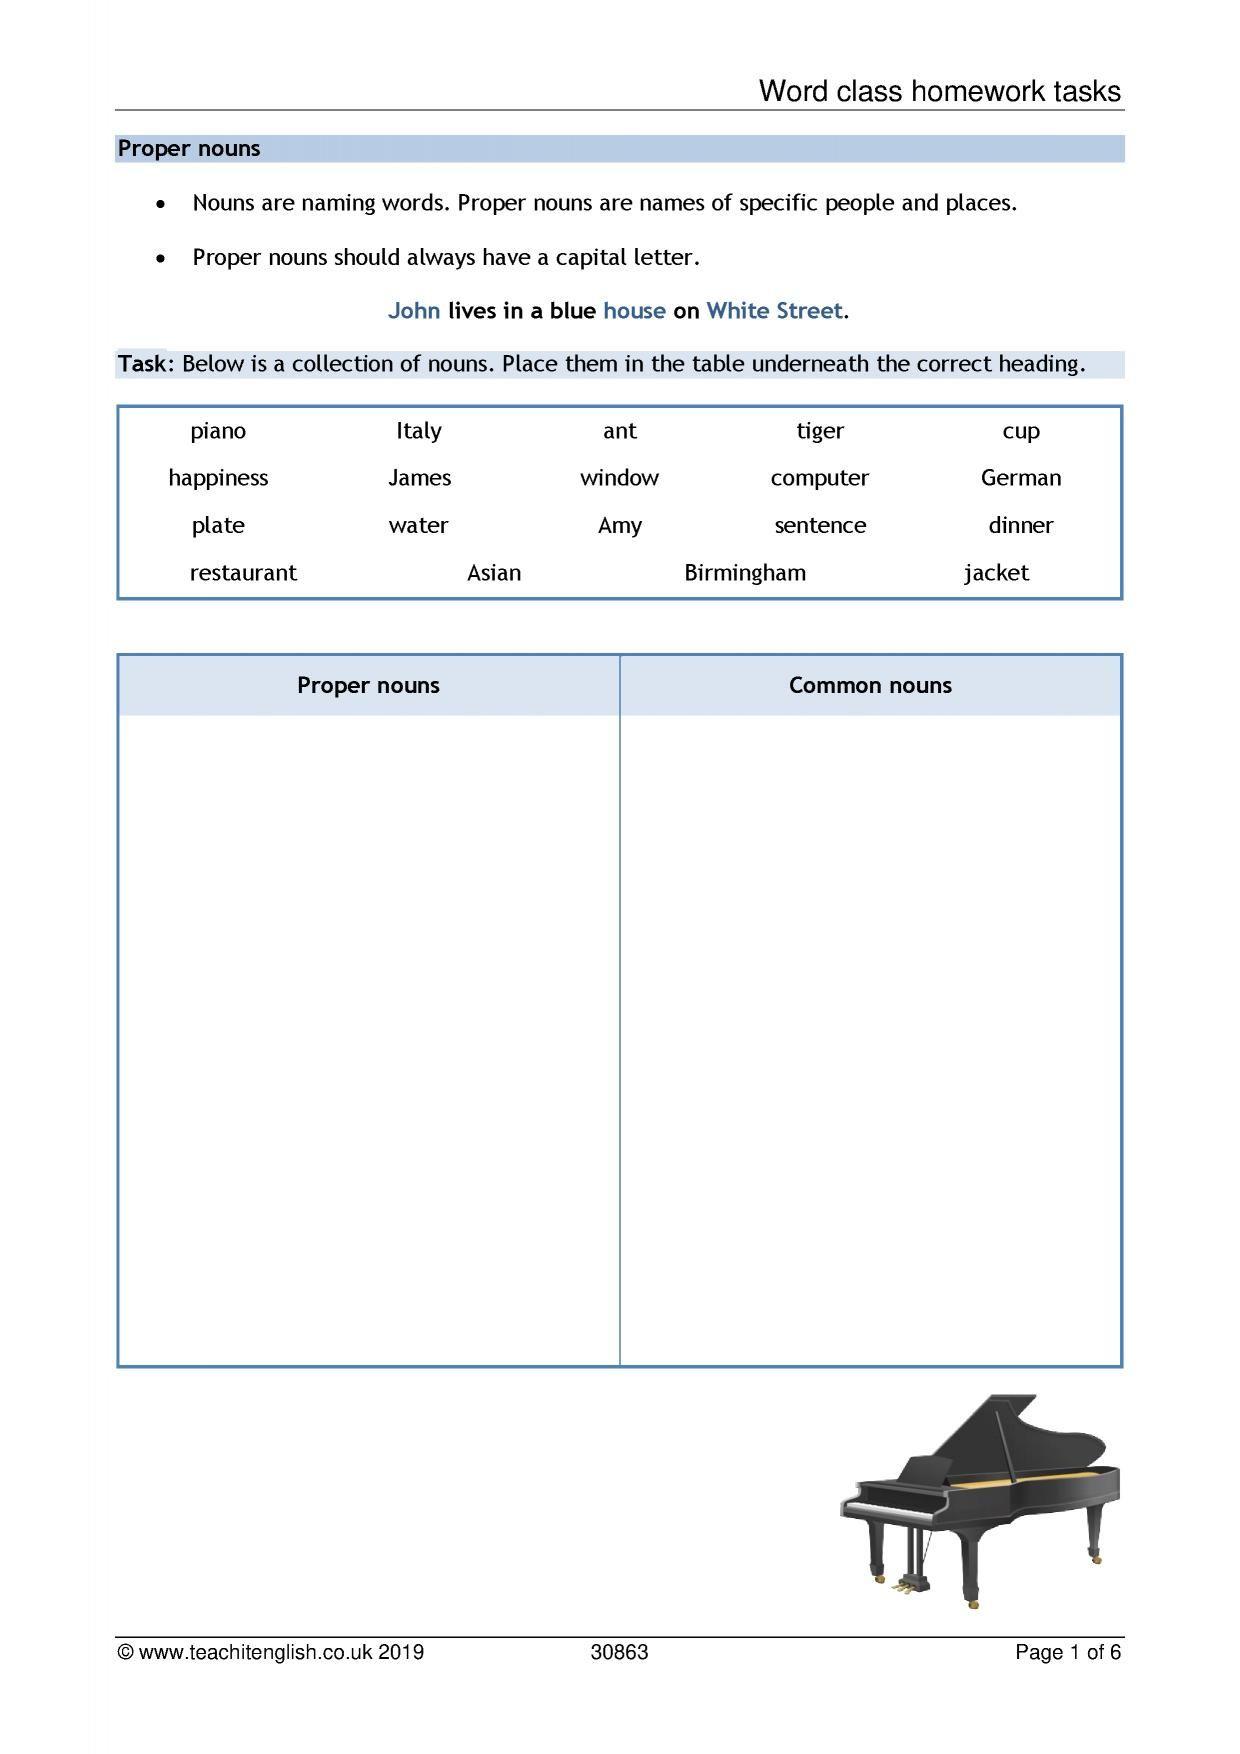 Word Class Homework Tasks In